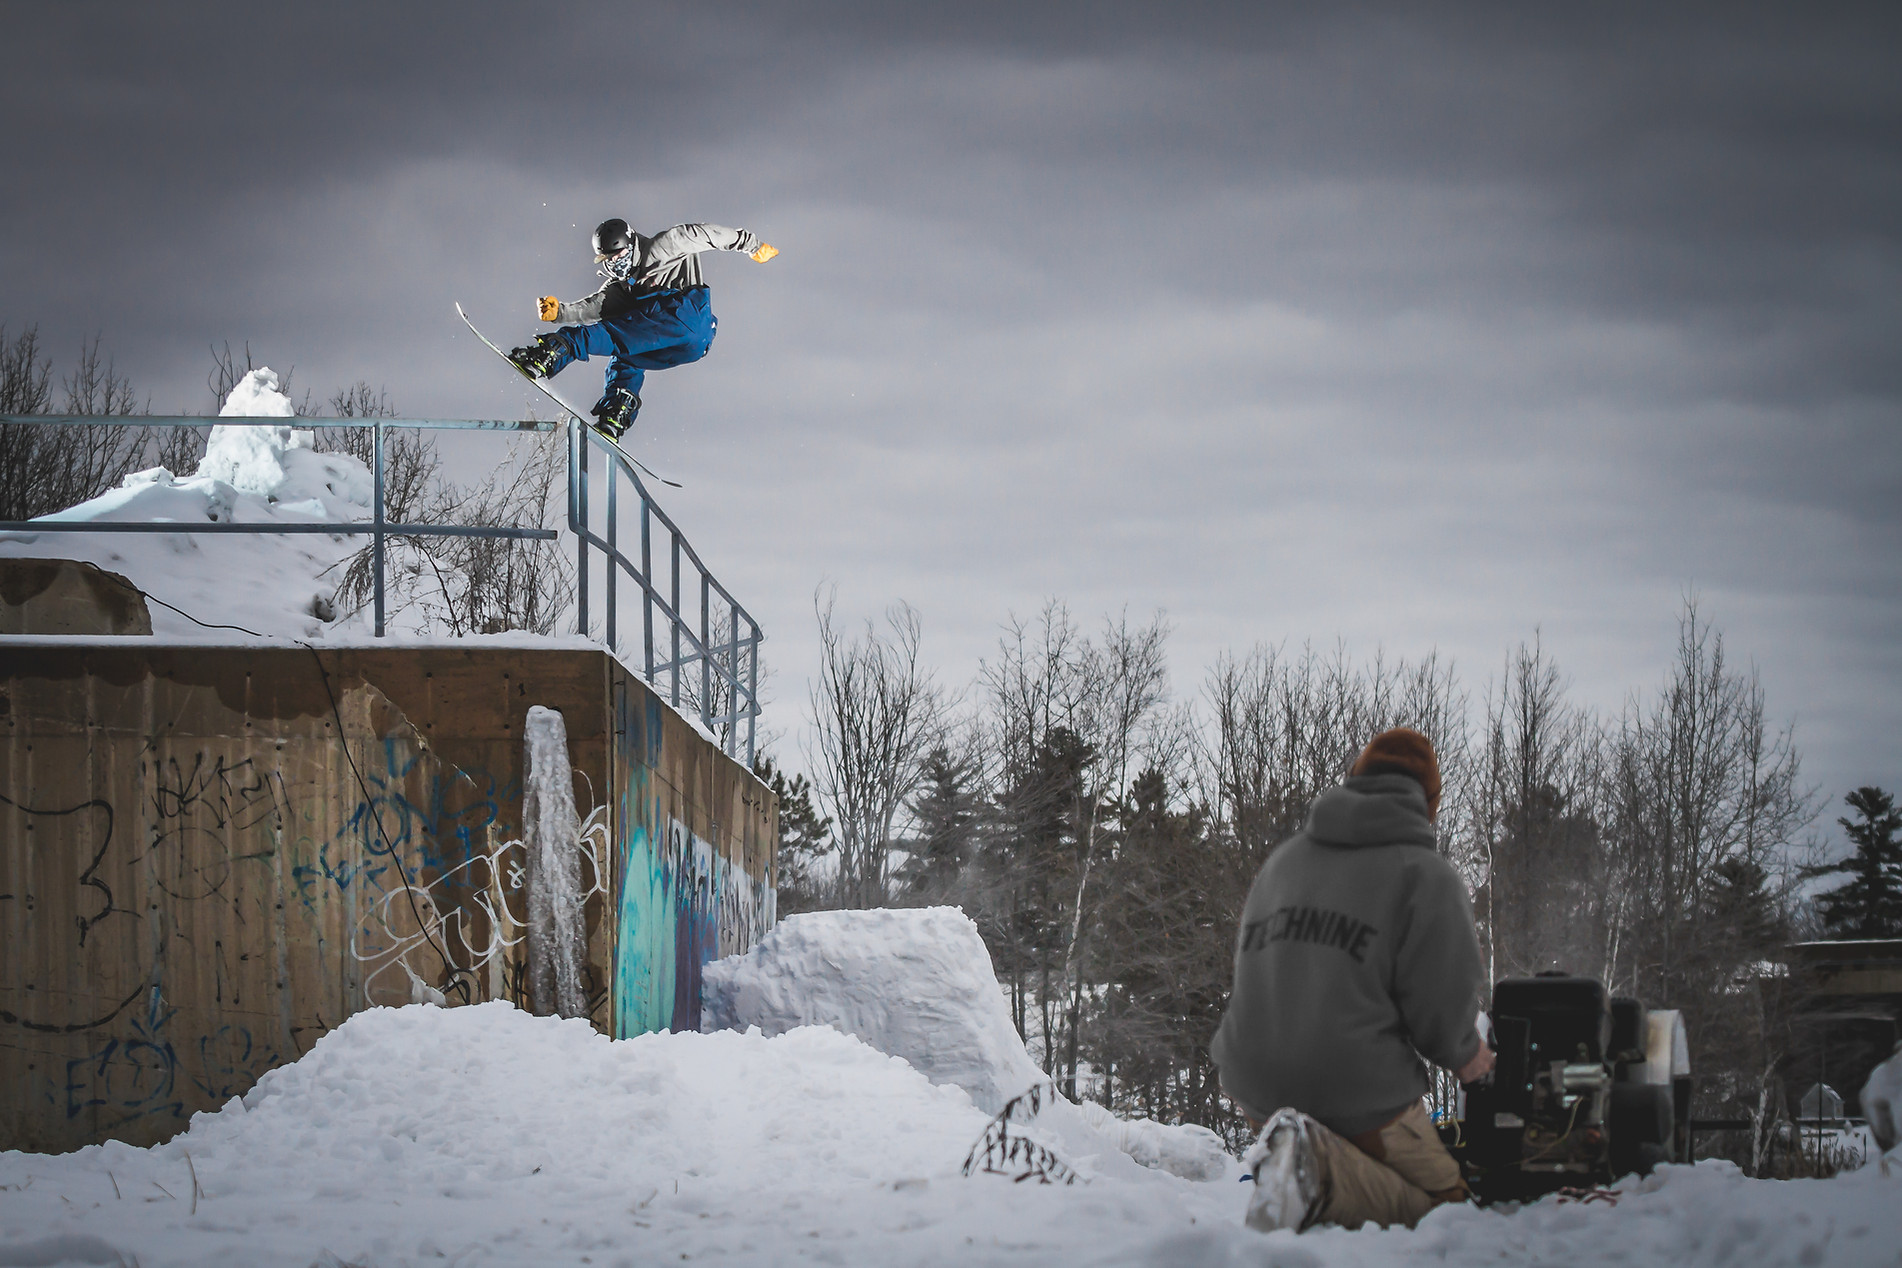 Photo of Will Mayo Snowboardin, by Randy Williams